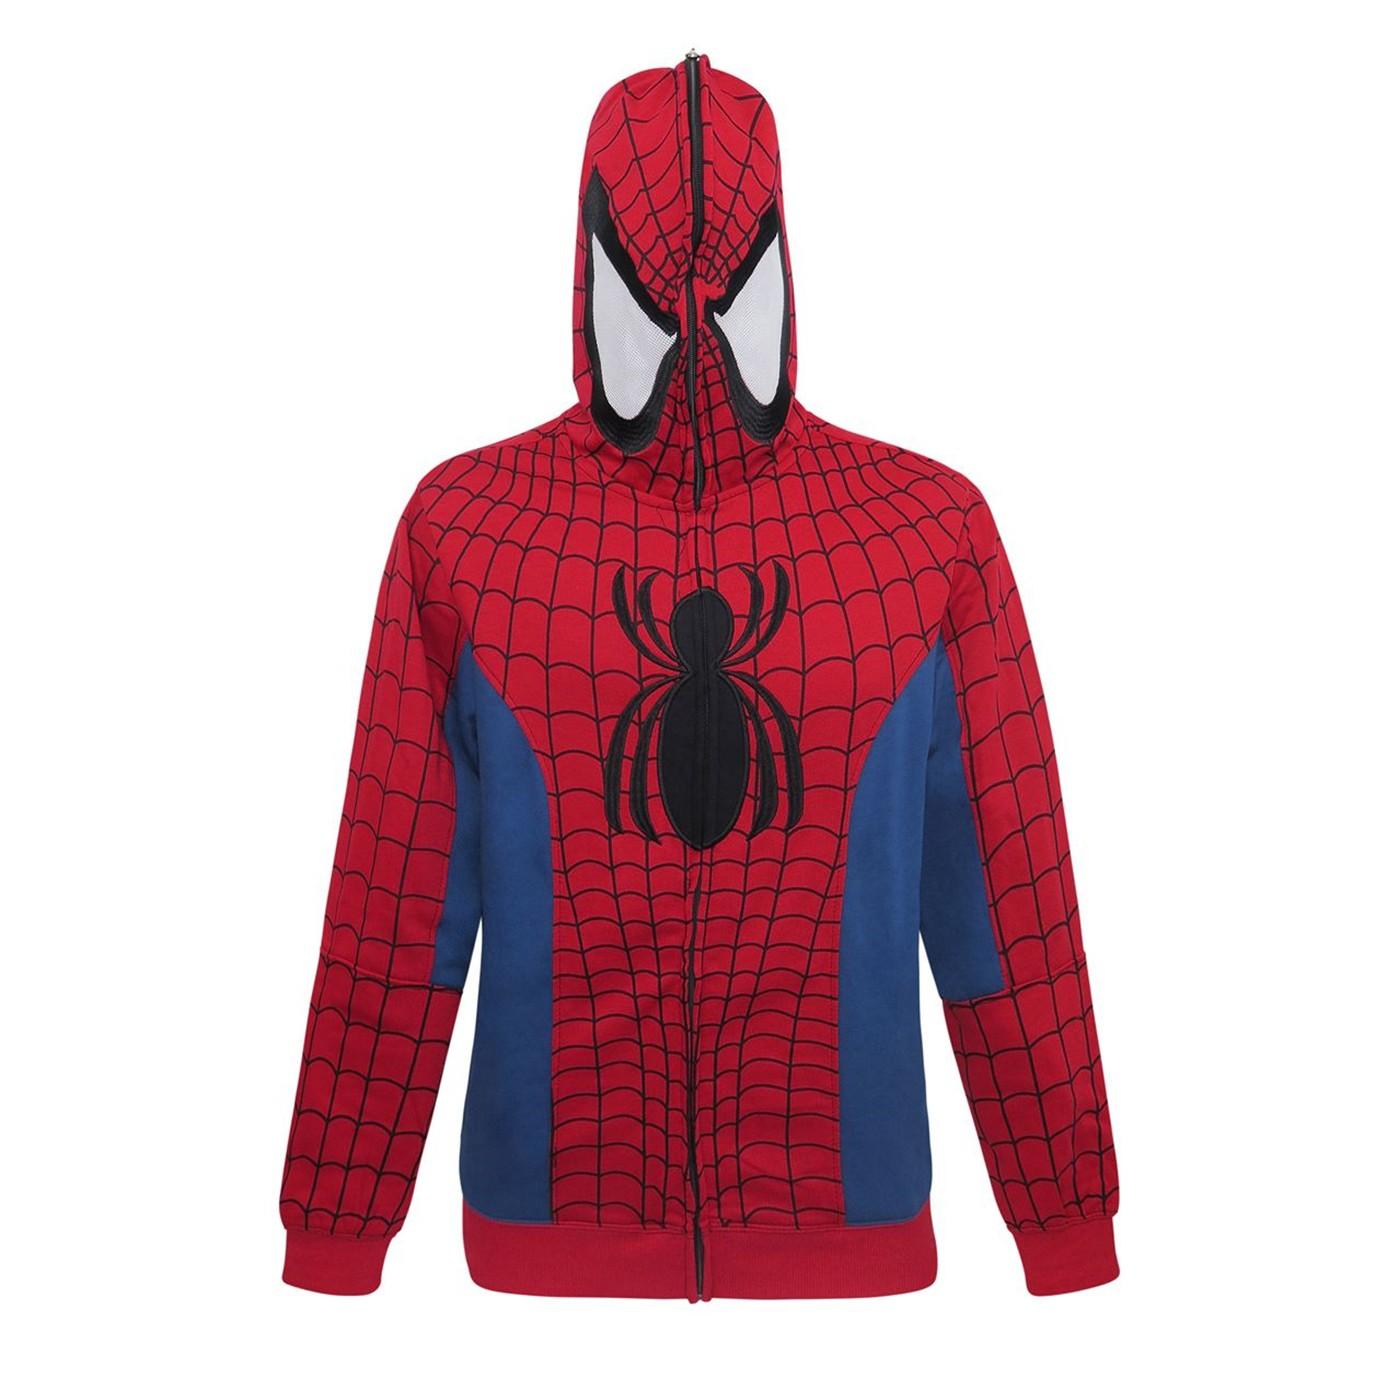 Spiderman Costume Kids Muscle - eBay